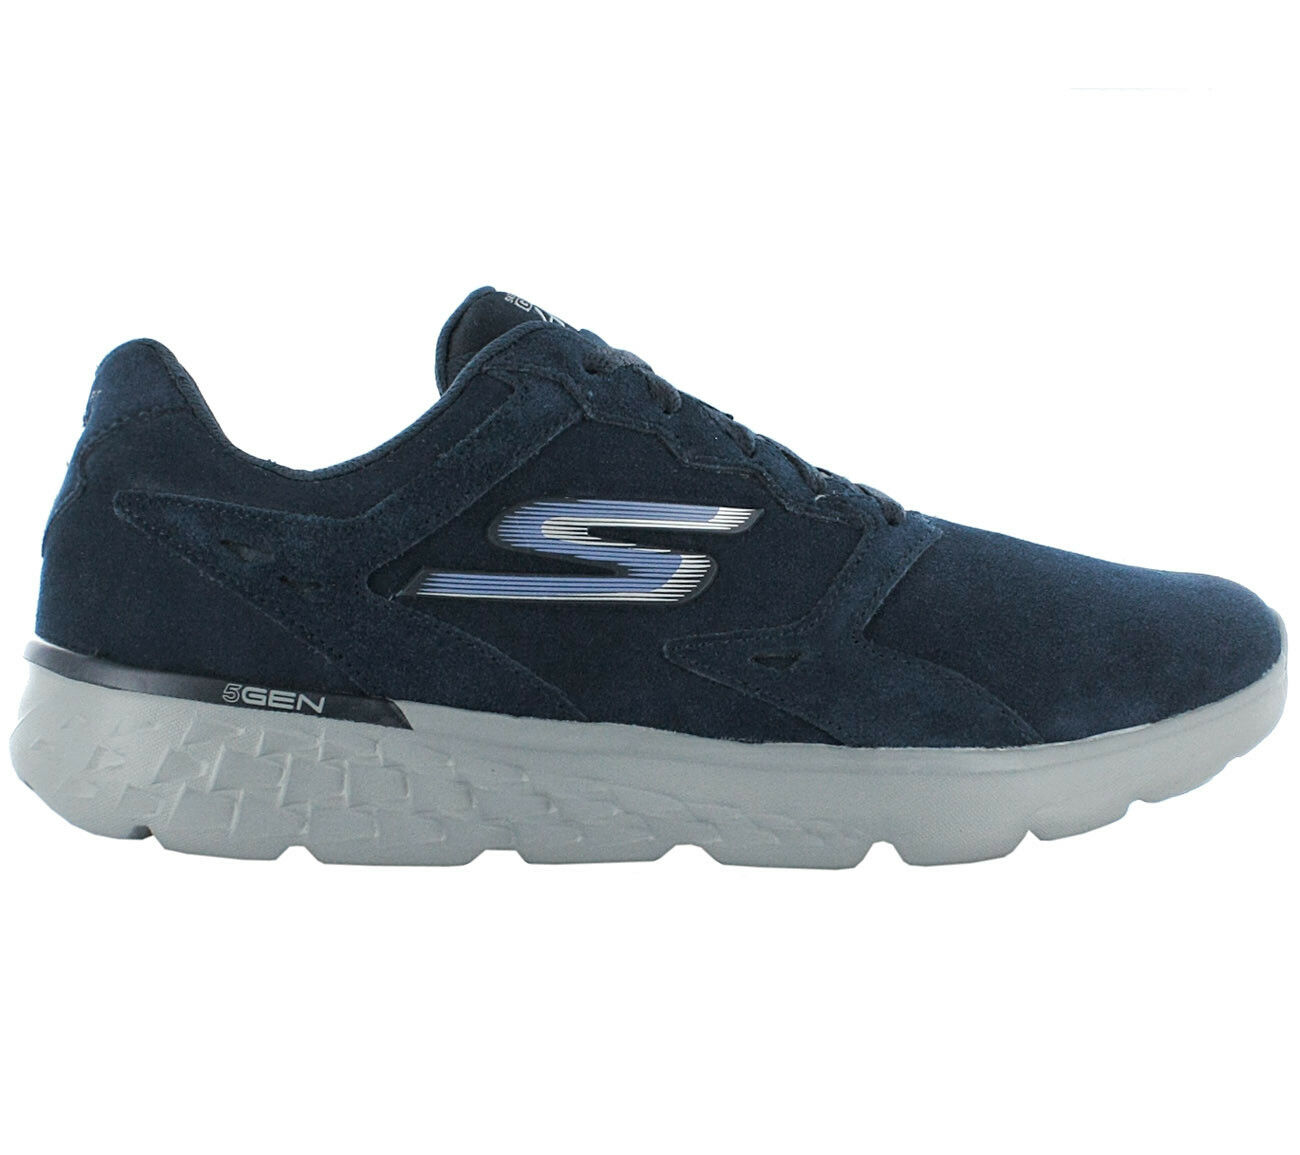 Skechers Performance Gorun 400 SWIFT Zapatillas Hombre Deporte Fitness Go Run Cheap women's shoes women's shoes